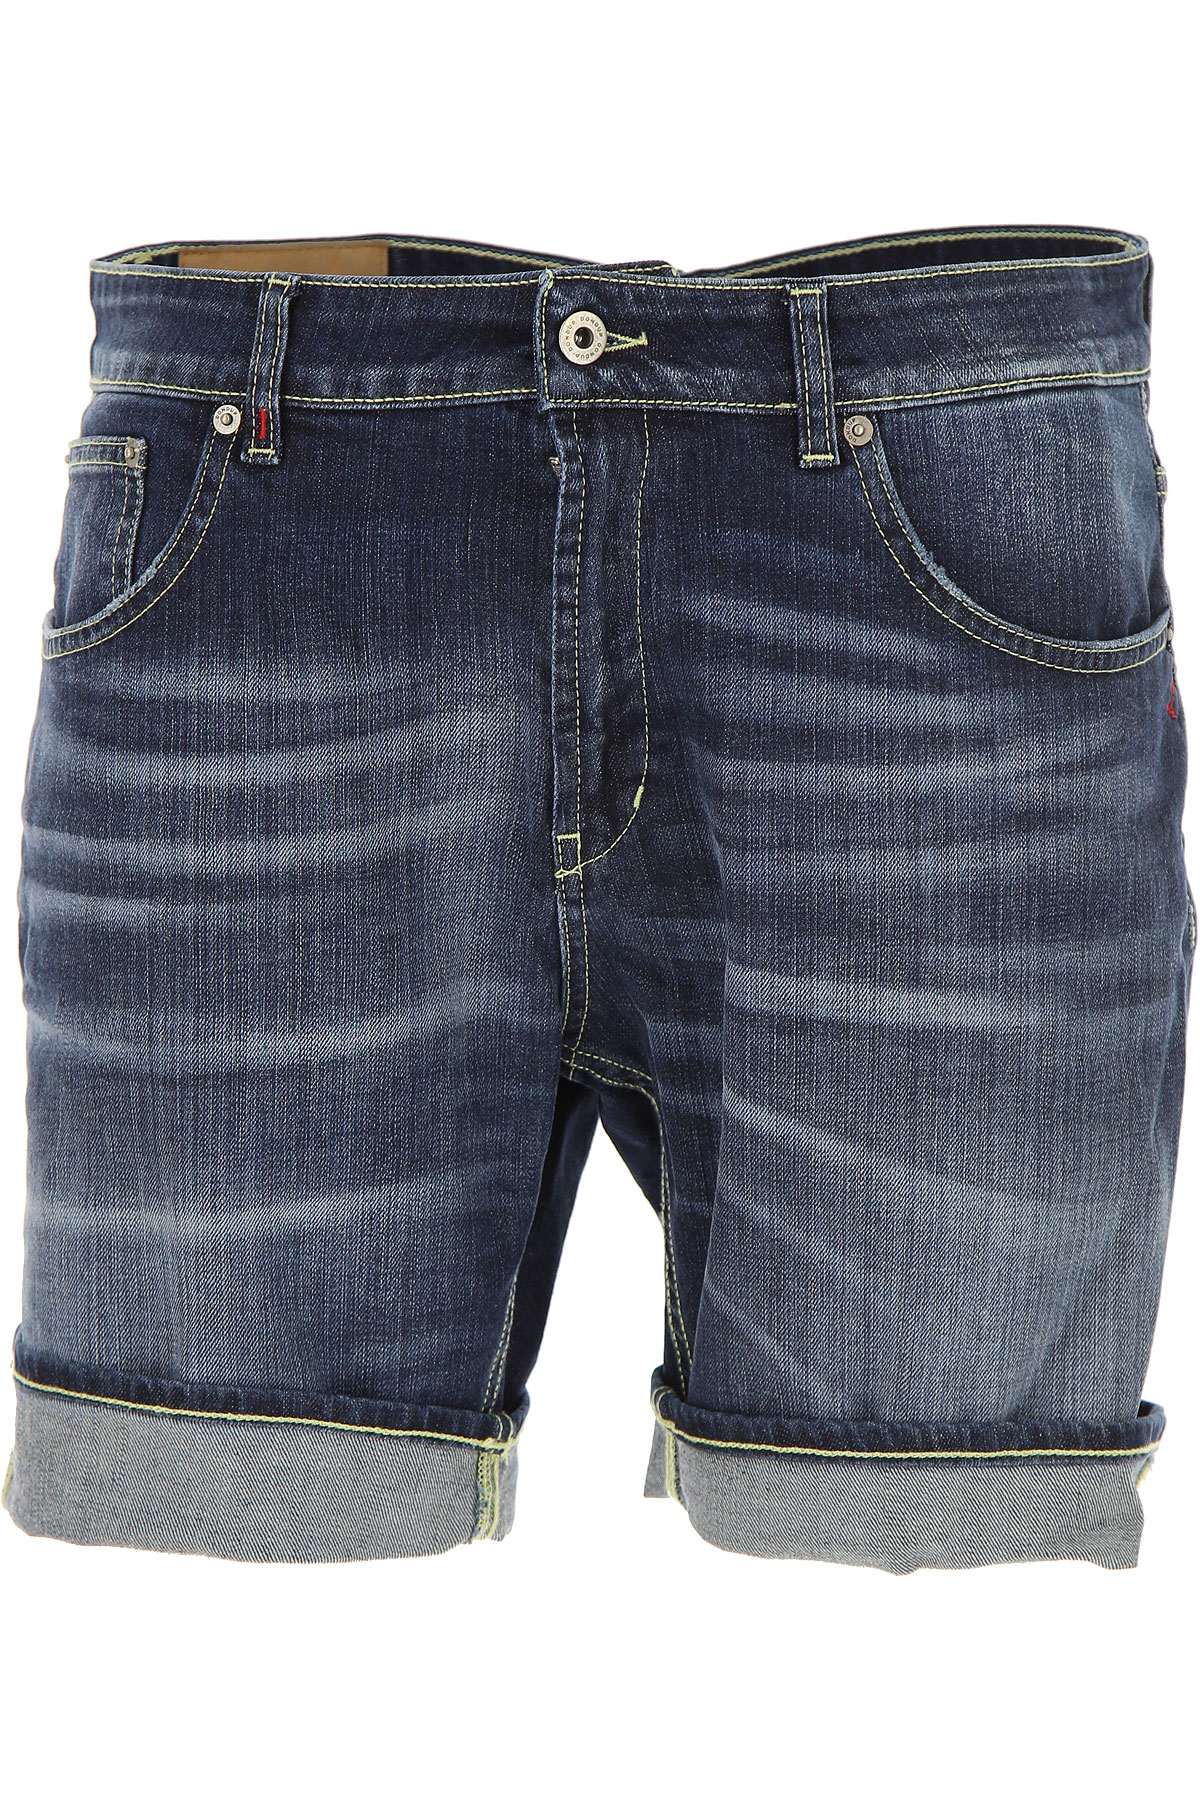 Image of Dondup Shorts for Men On Sale, Blue, Cotton, 2017, 29 32 38